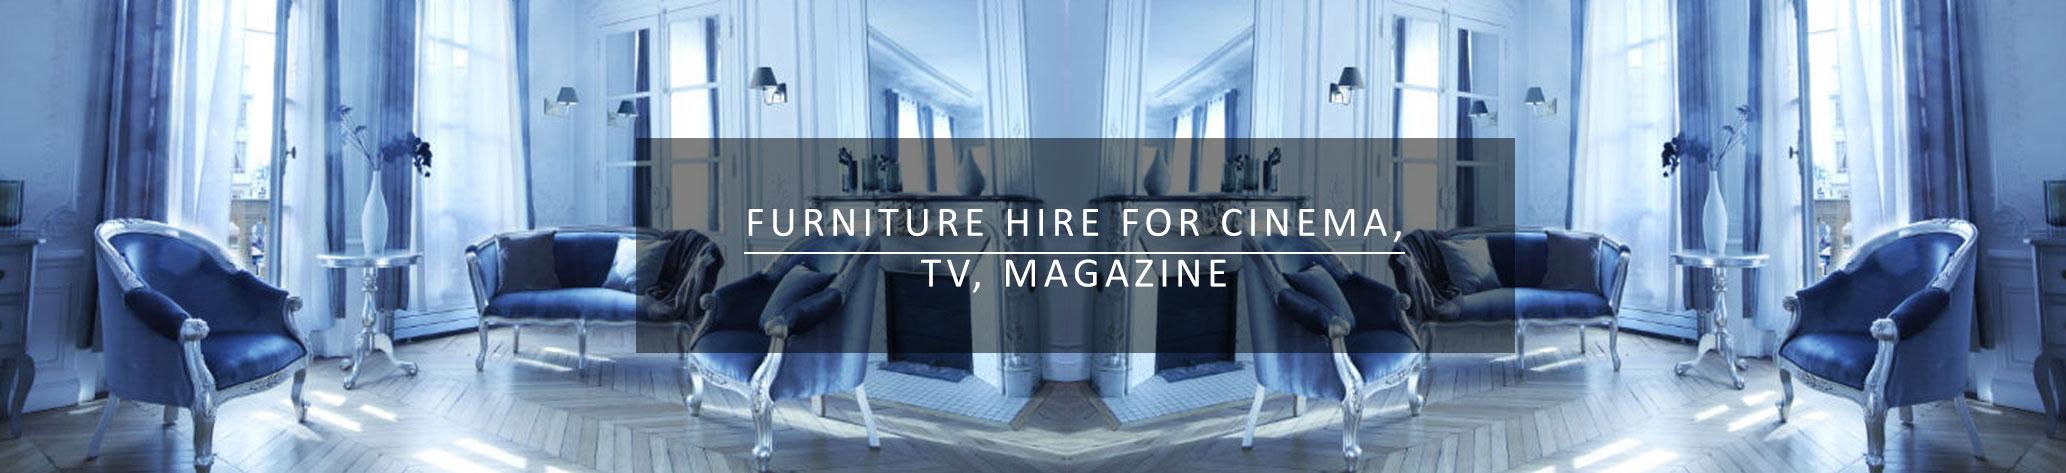 furniture hire for cinema tv magazine